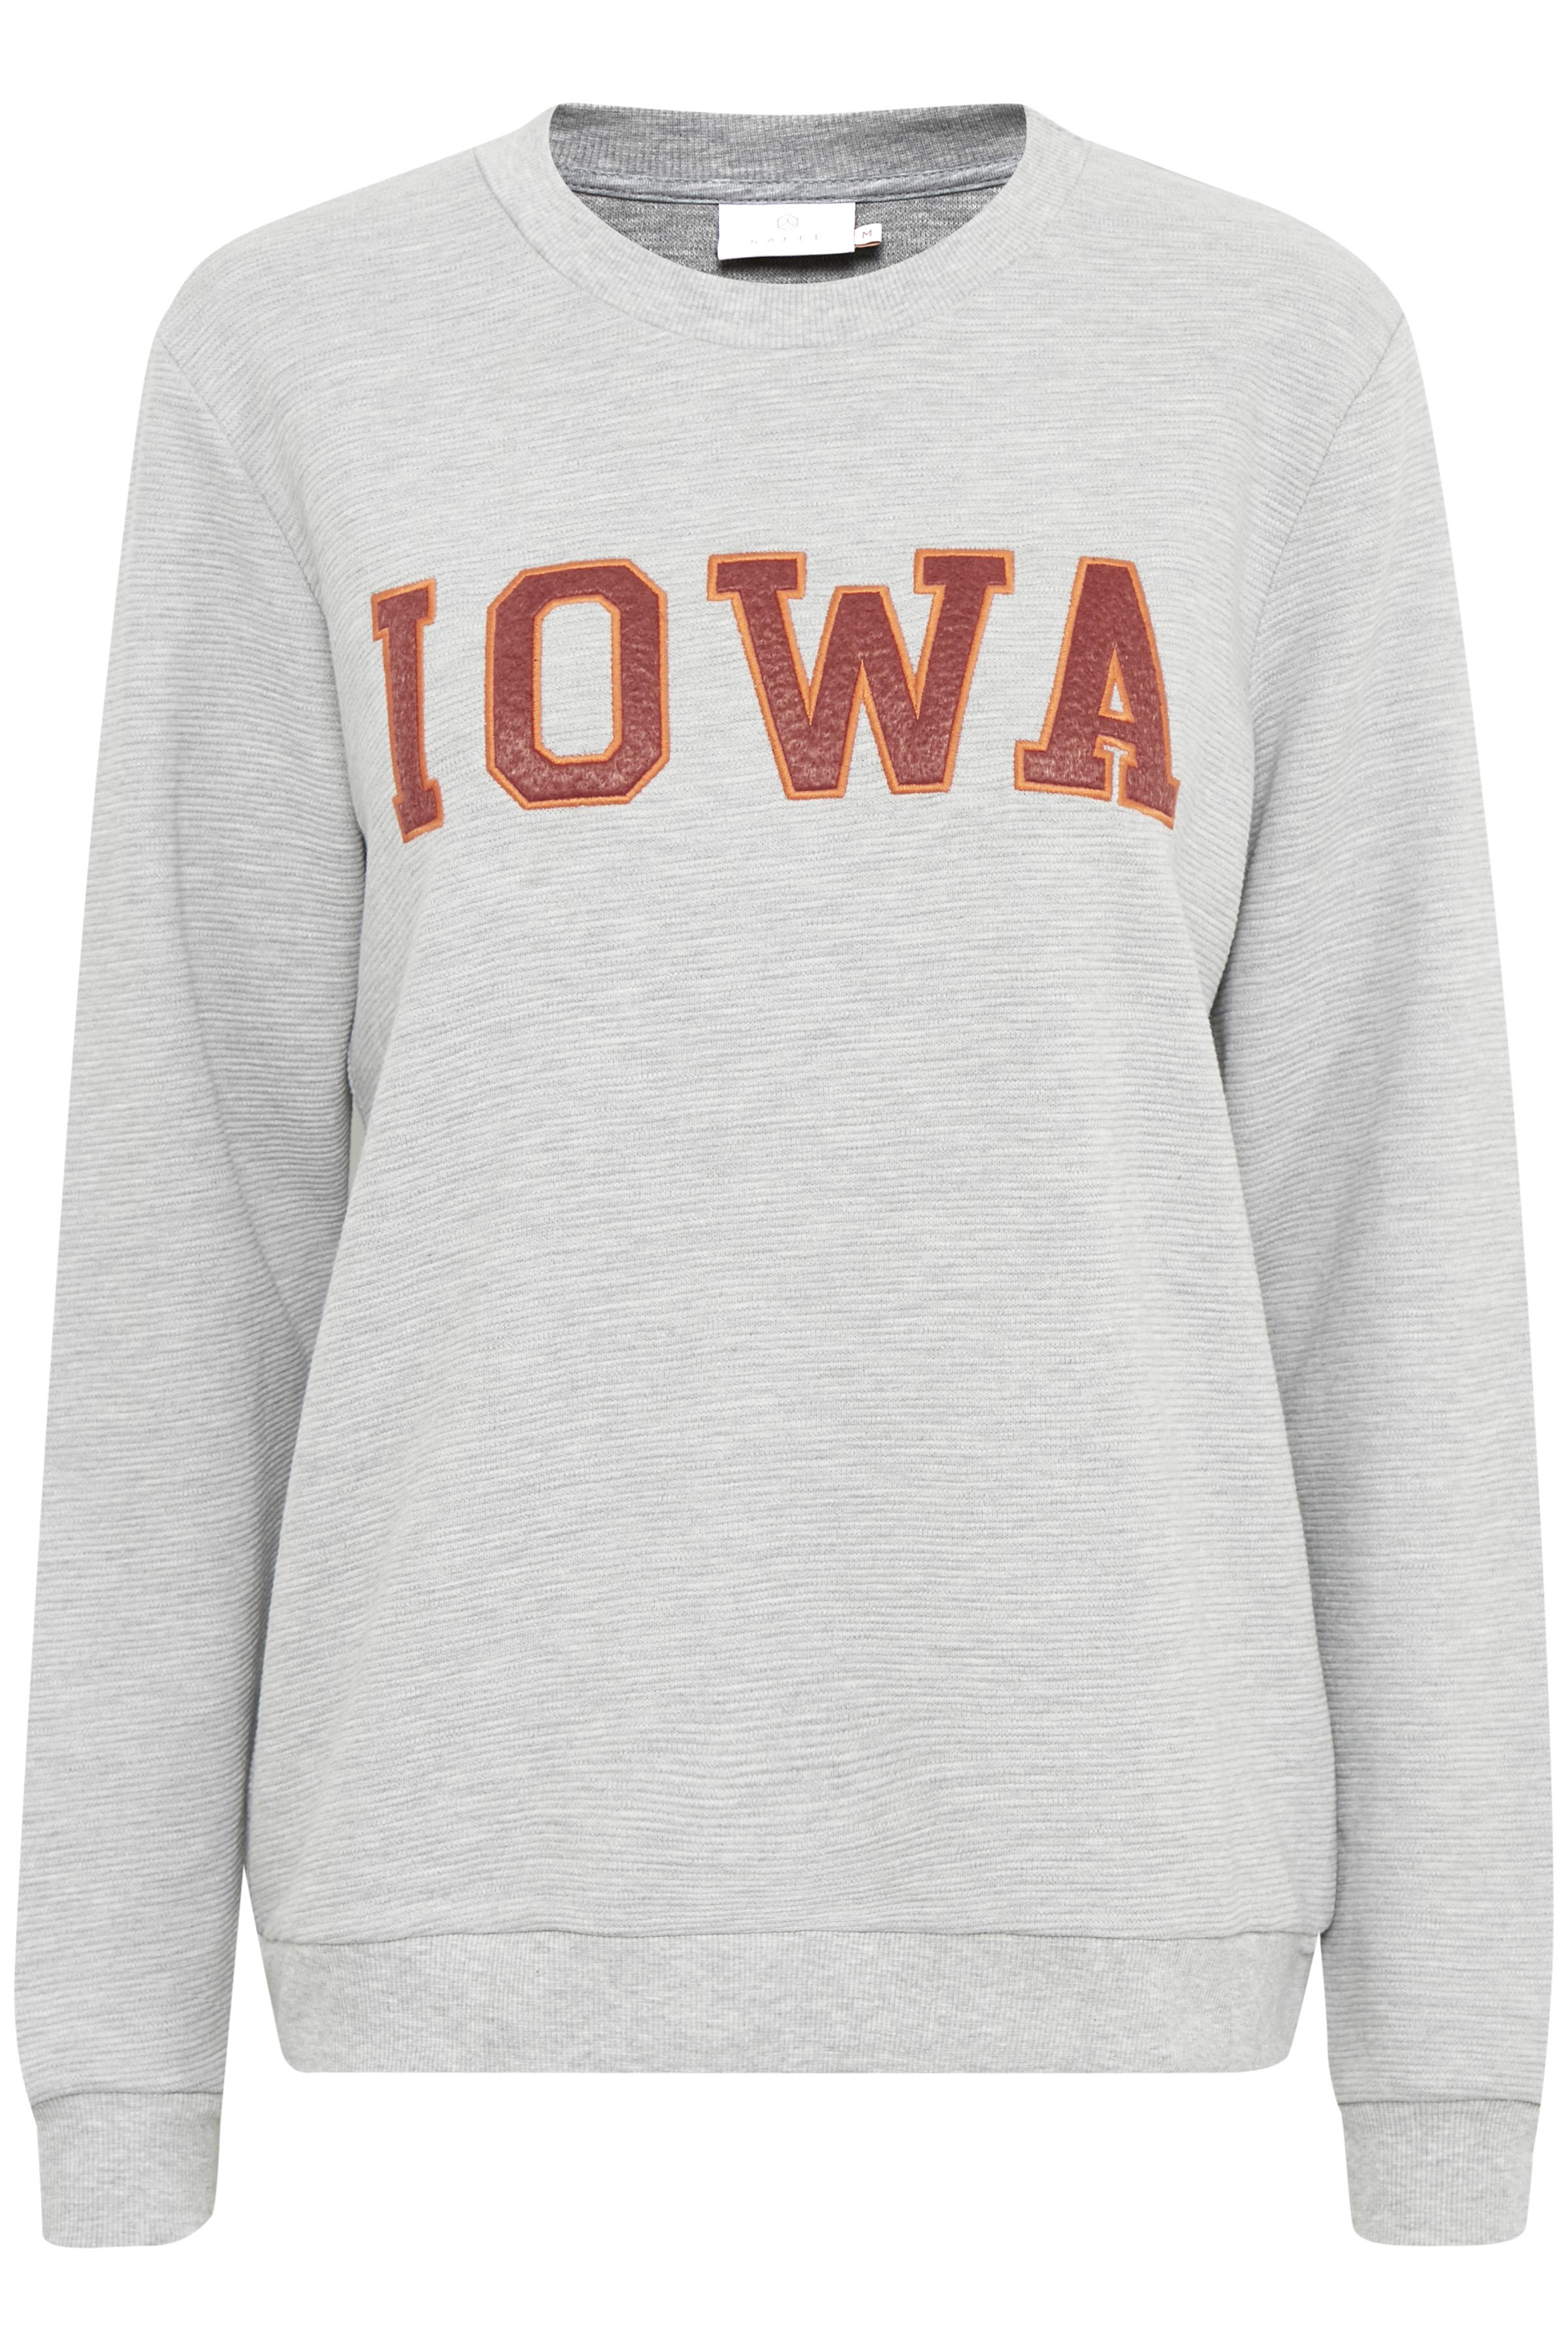 Gråmeleret Sweatshirt fra Kaffe – Køb Gråmeleret Sweatshirt fra str. XS-XXL her